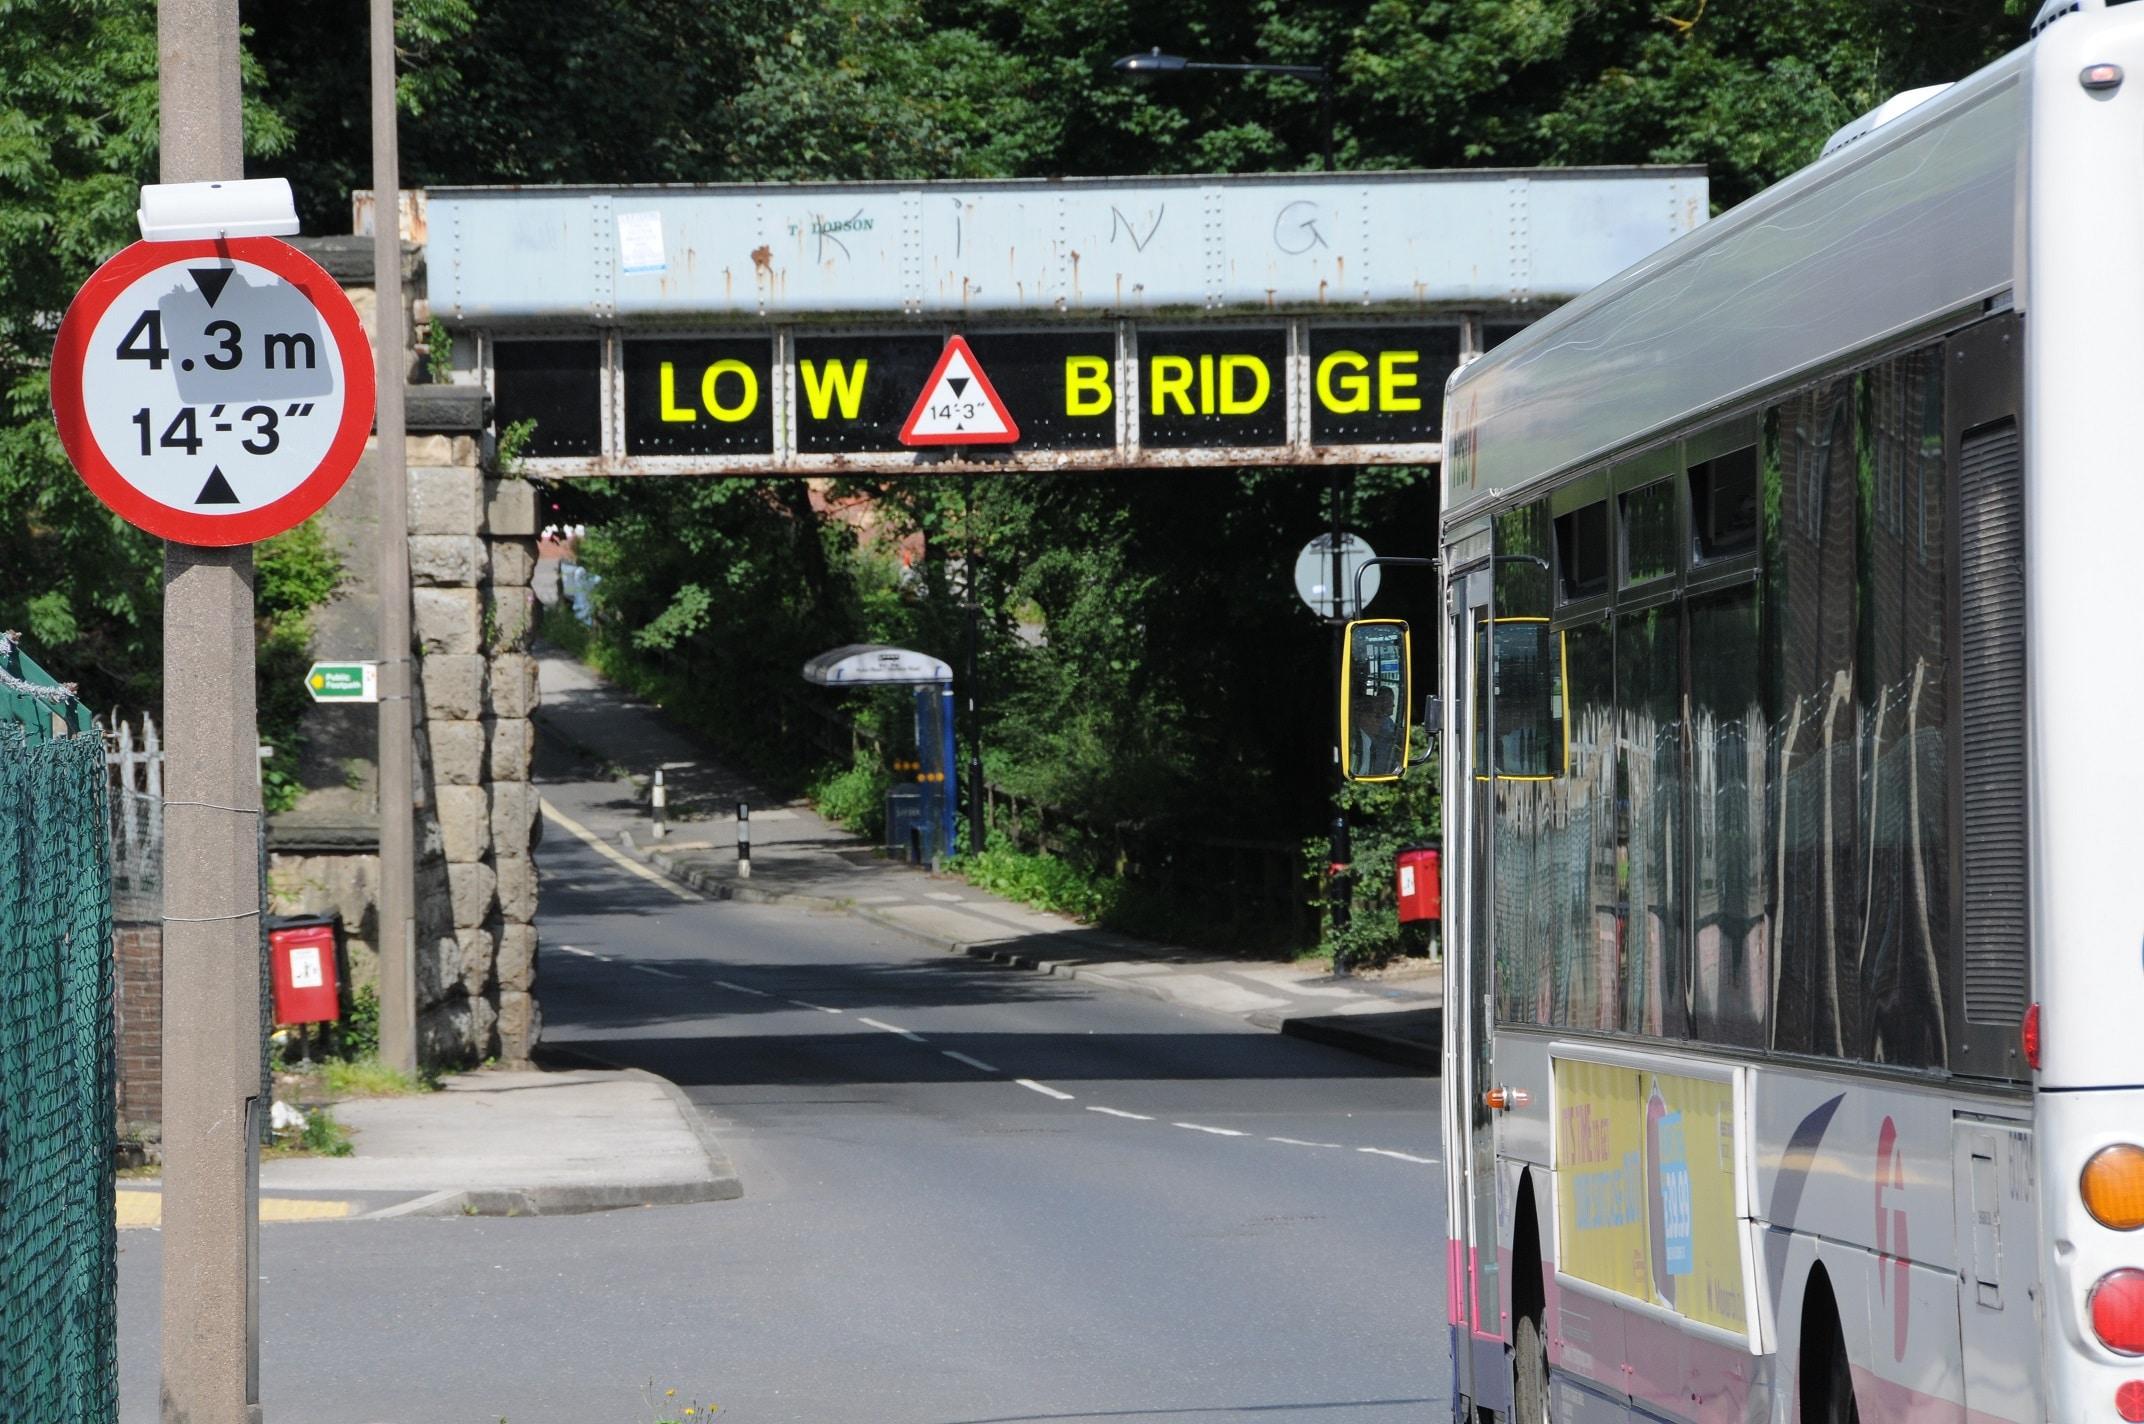 Bridge strike prevention